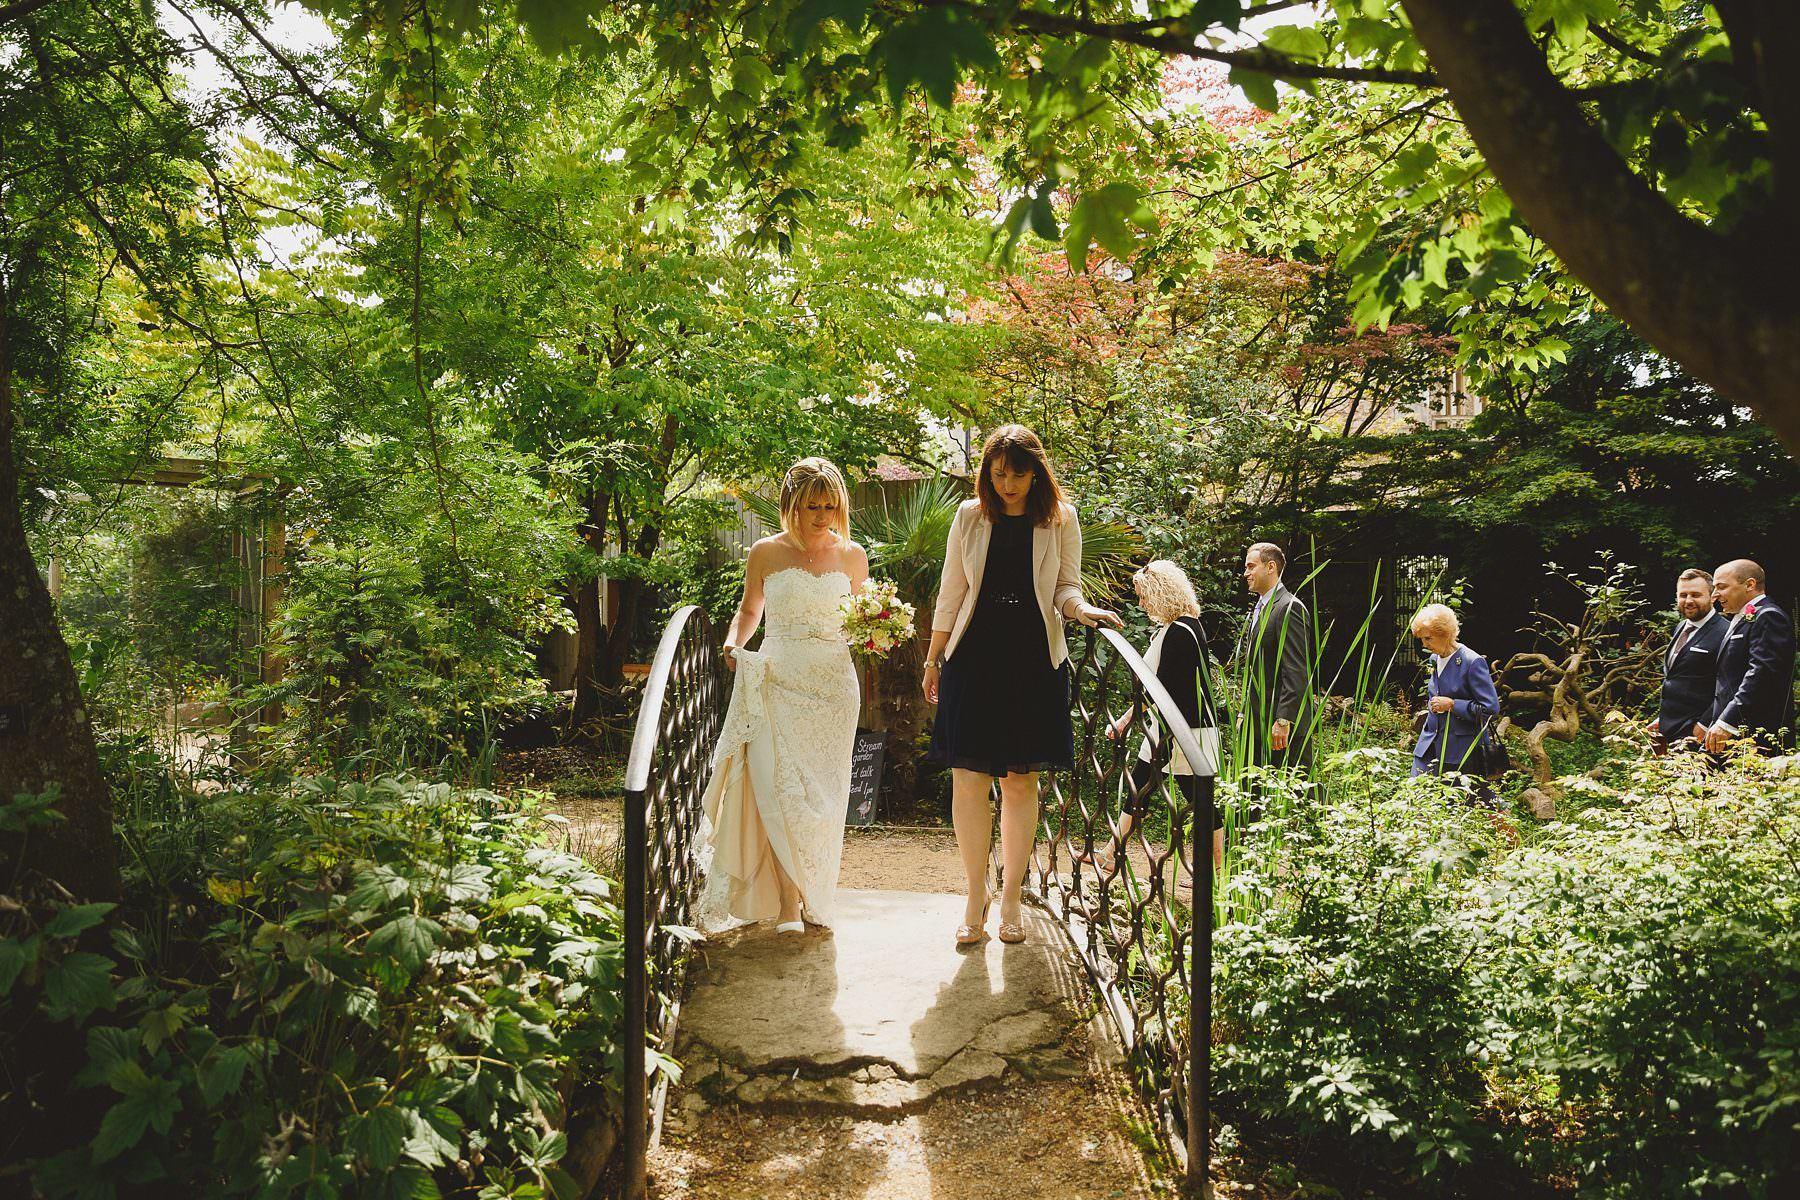 weddings-at-bristol-zoo-006